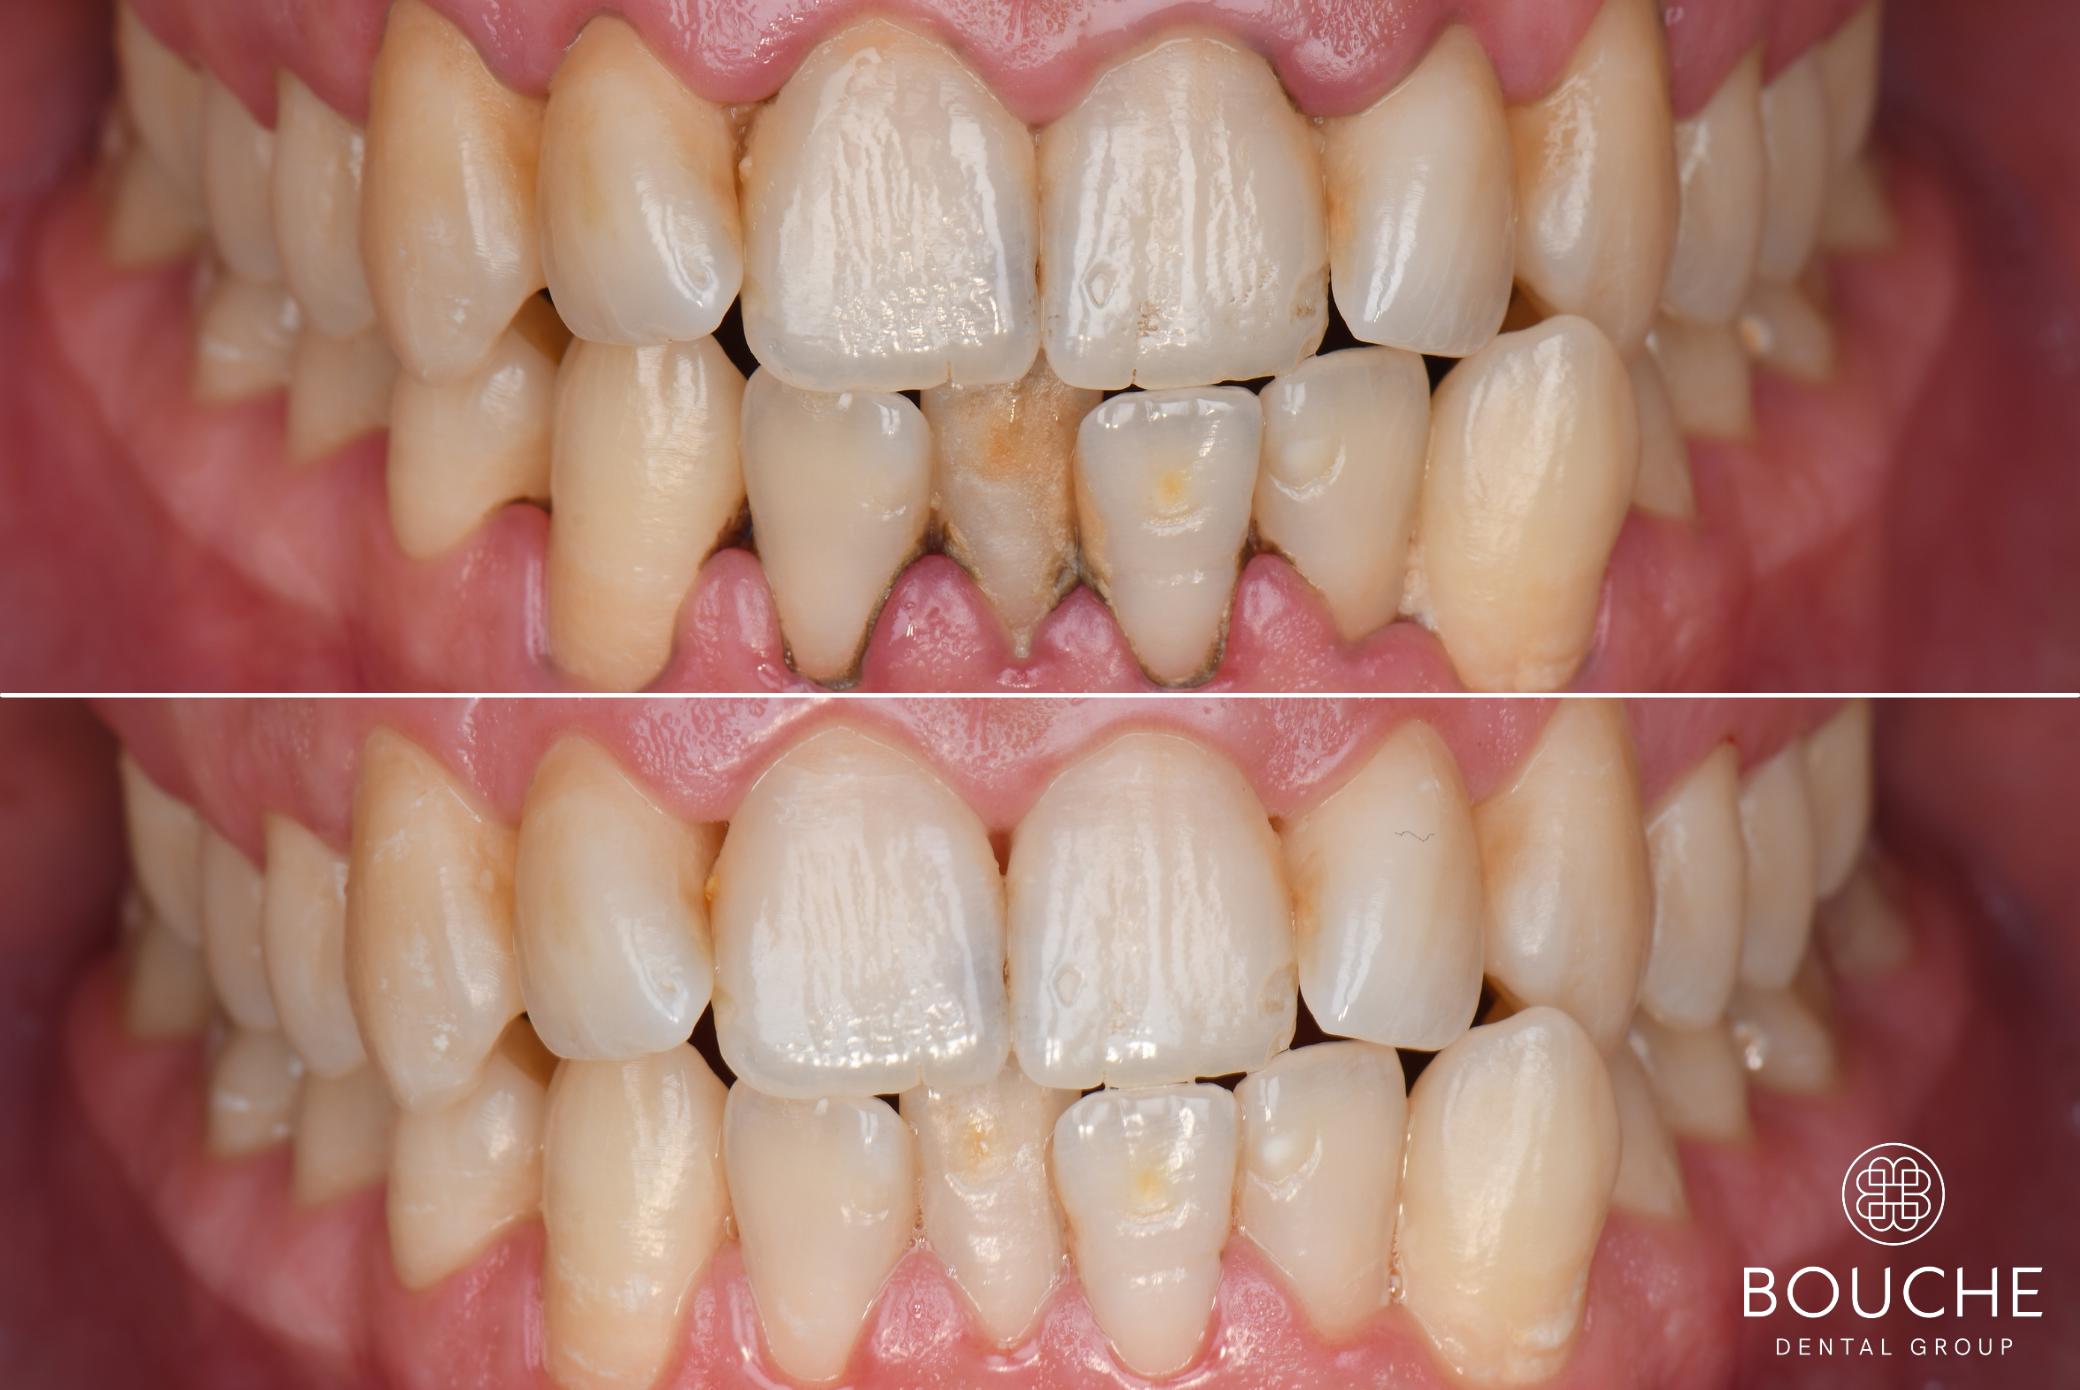 higiene oral bouche dental group